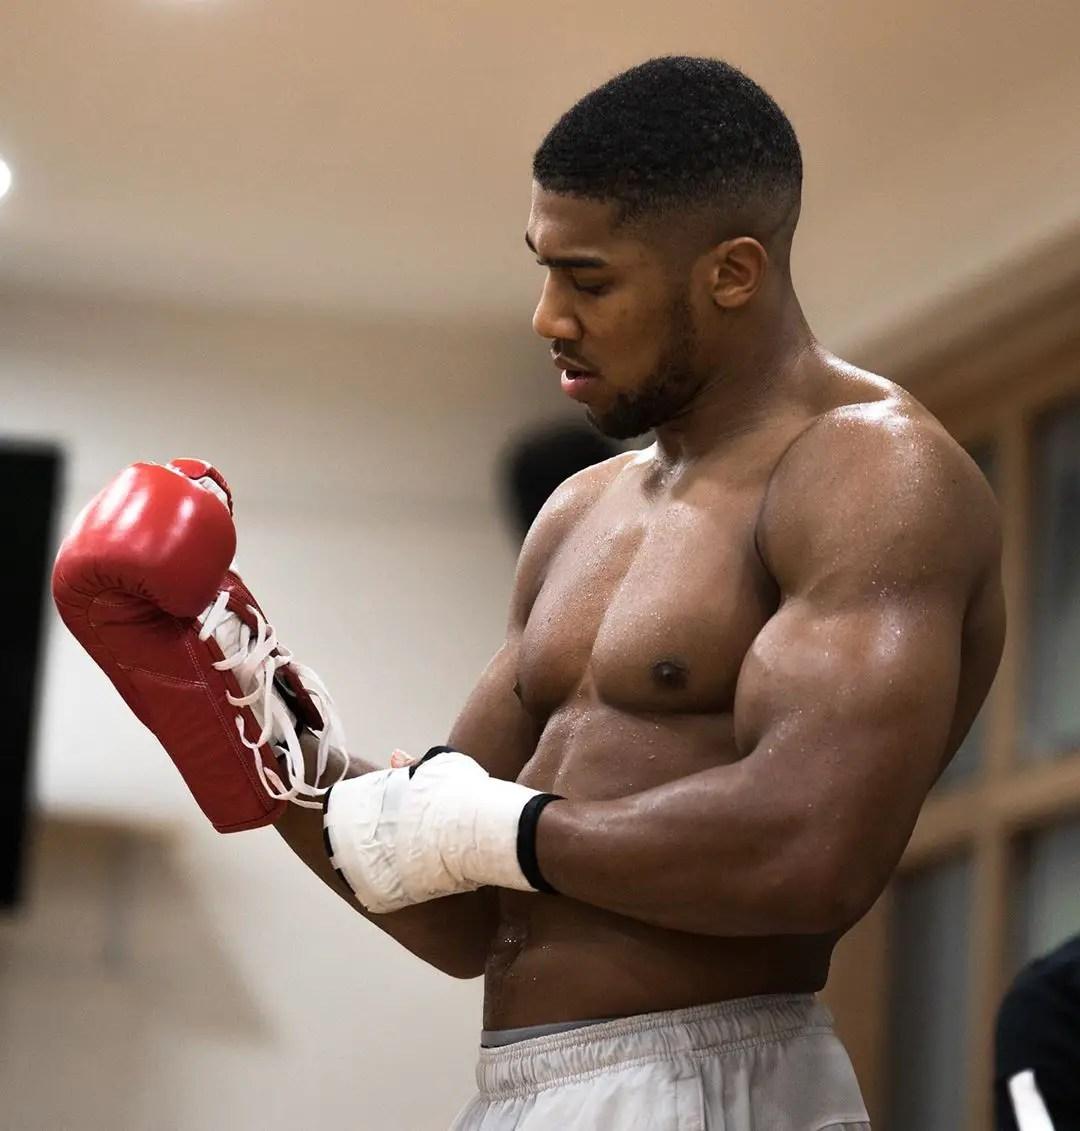 Joshua Not Interested In Fighting Tyson